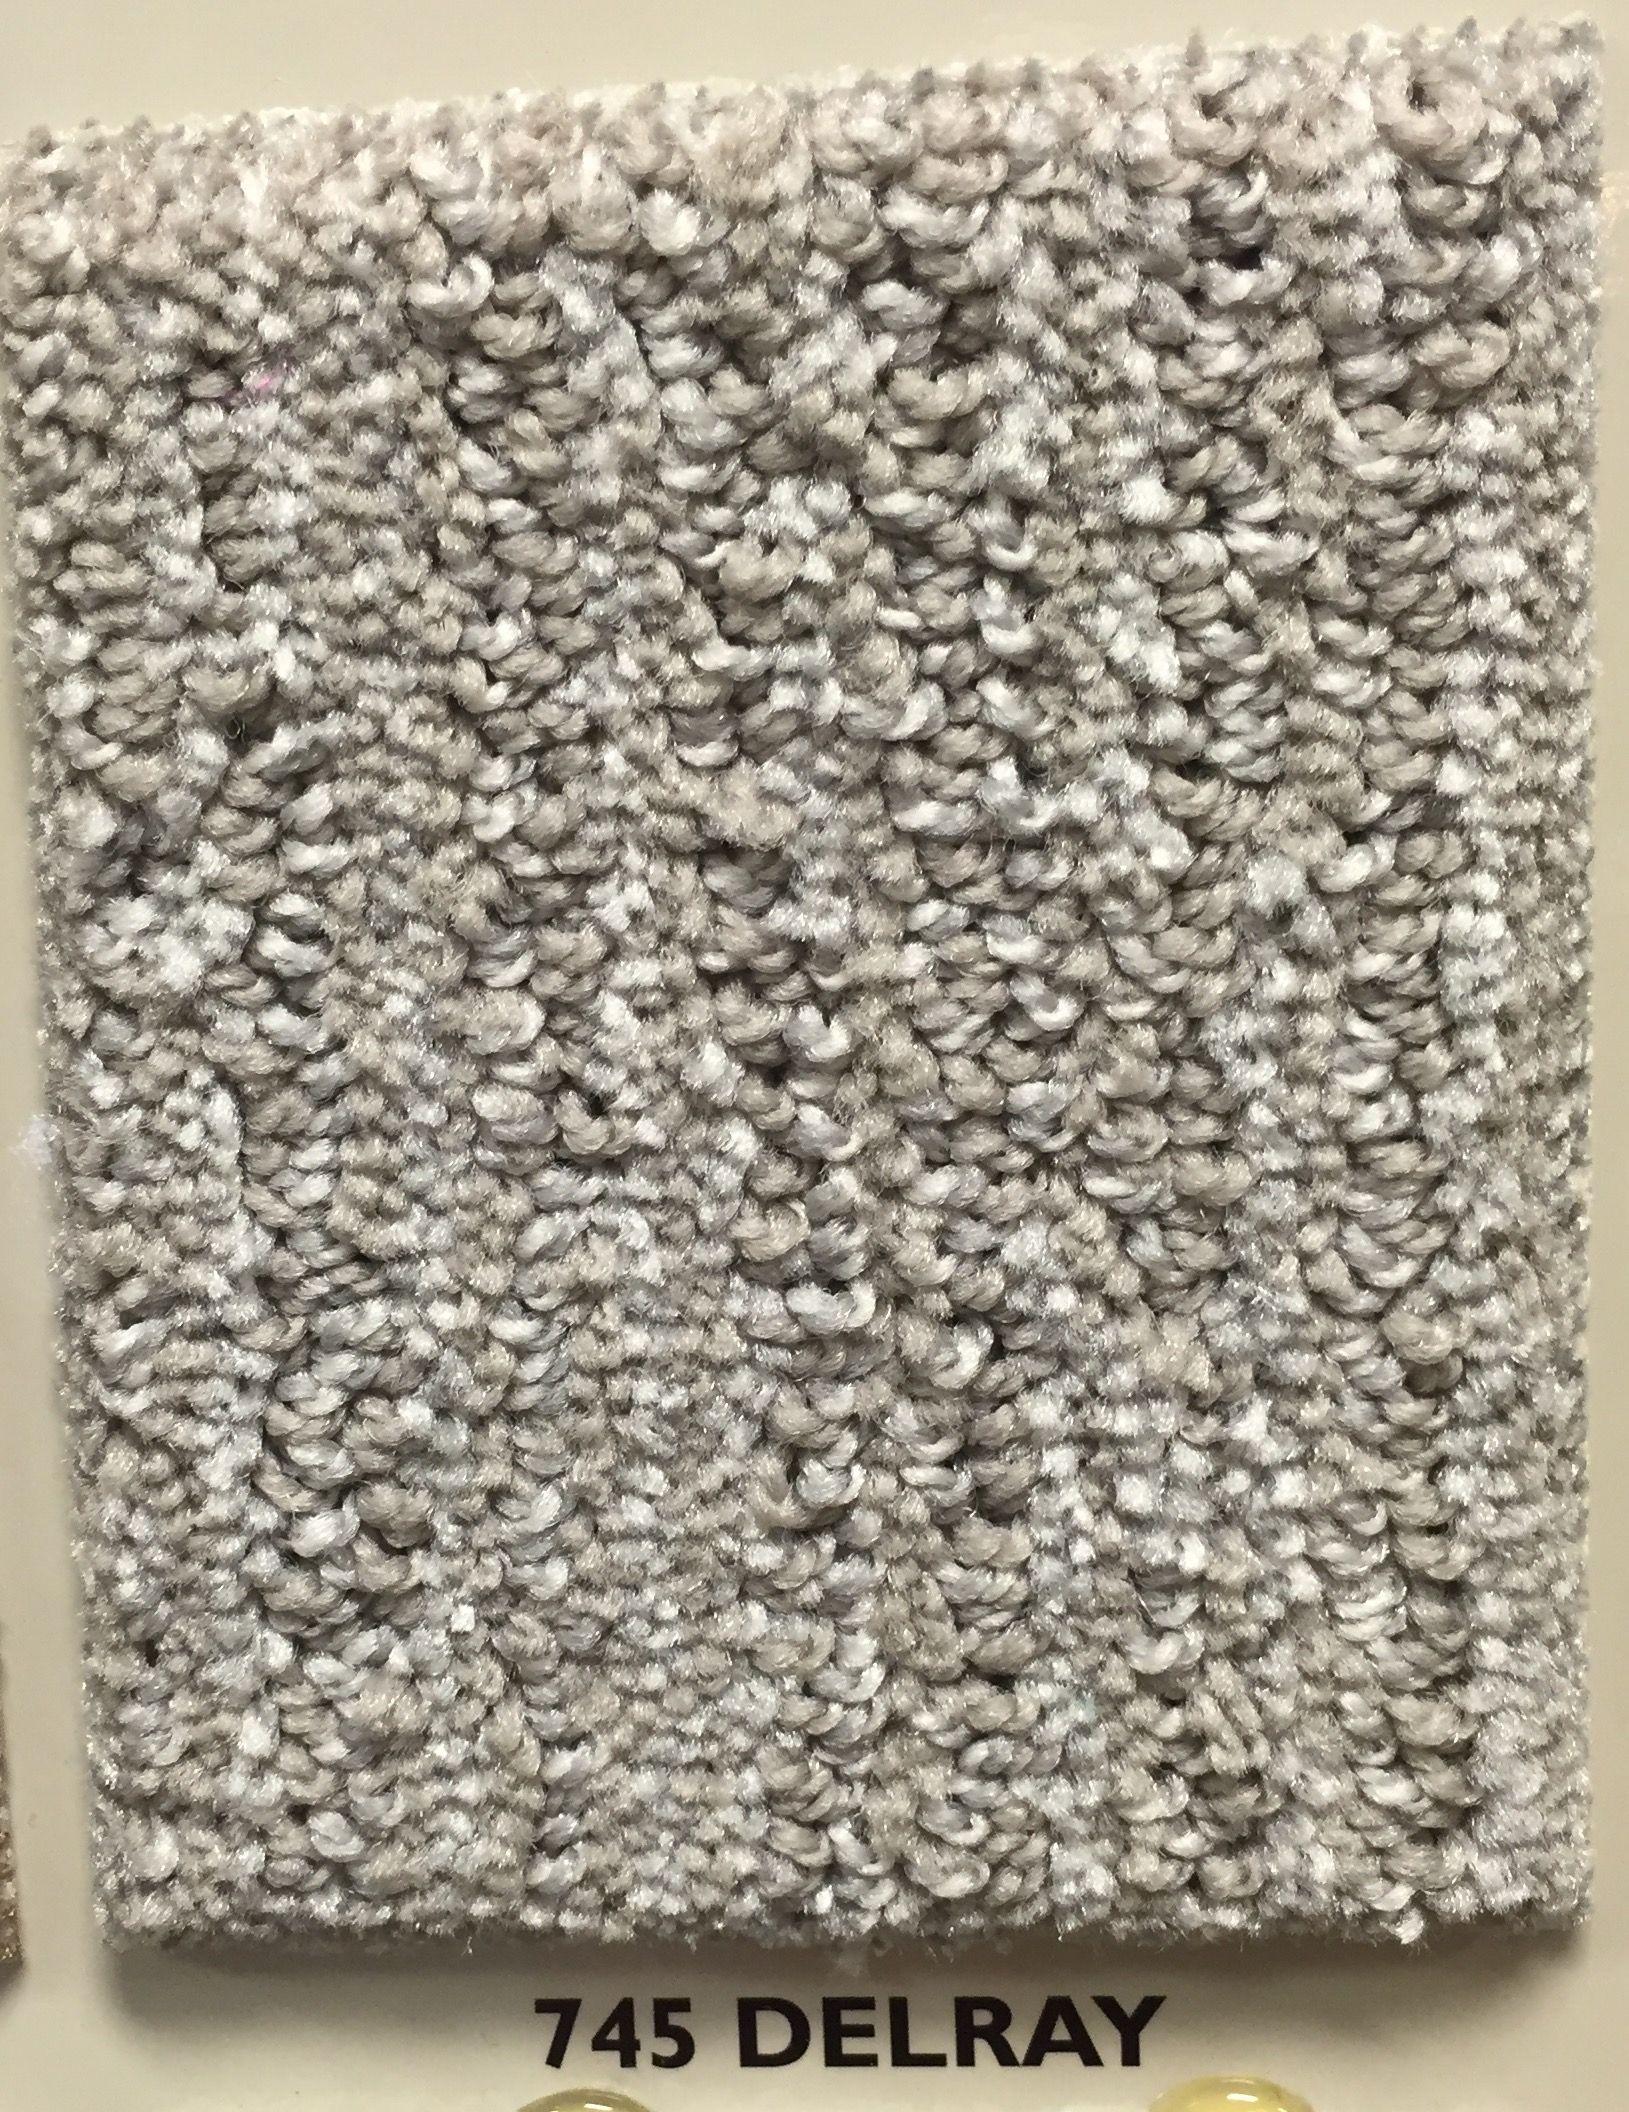 Bed 3 Carpet Dwellings Dw300 Oceanview Del Ray 745